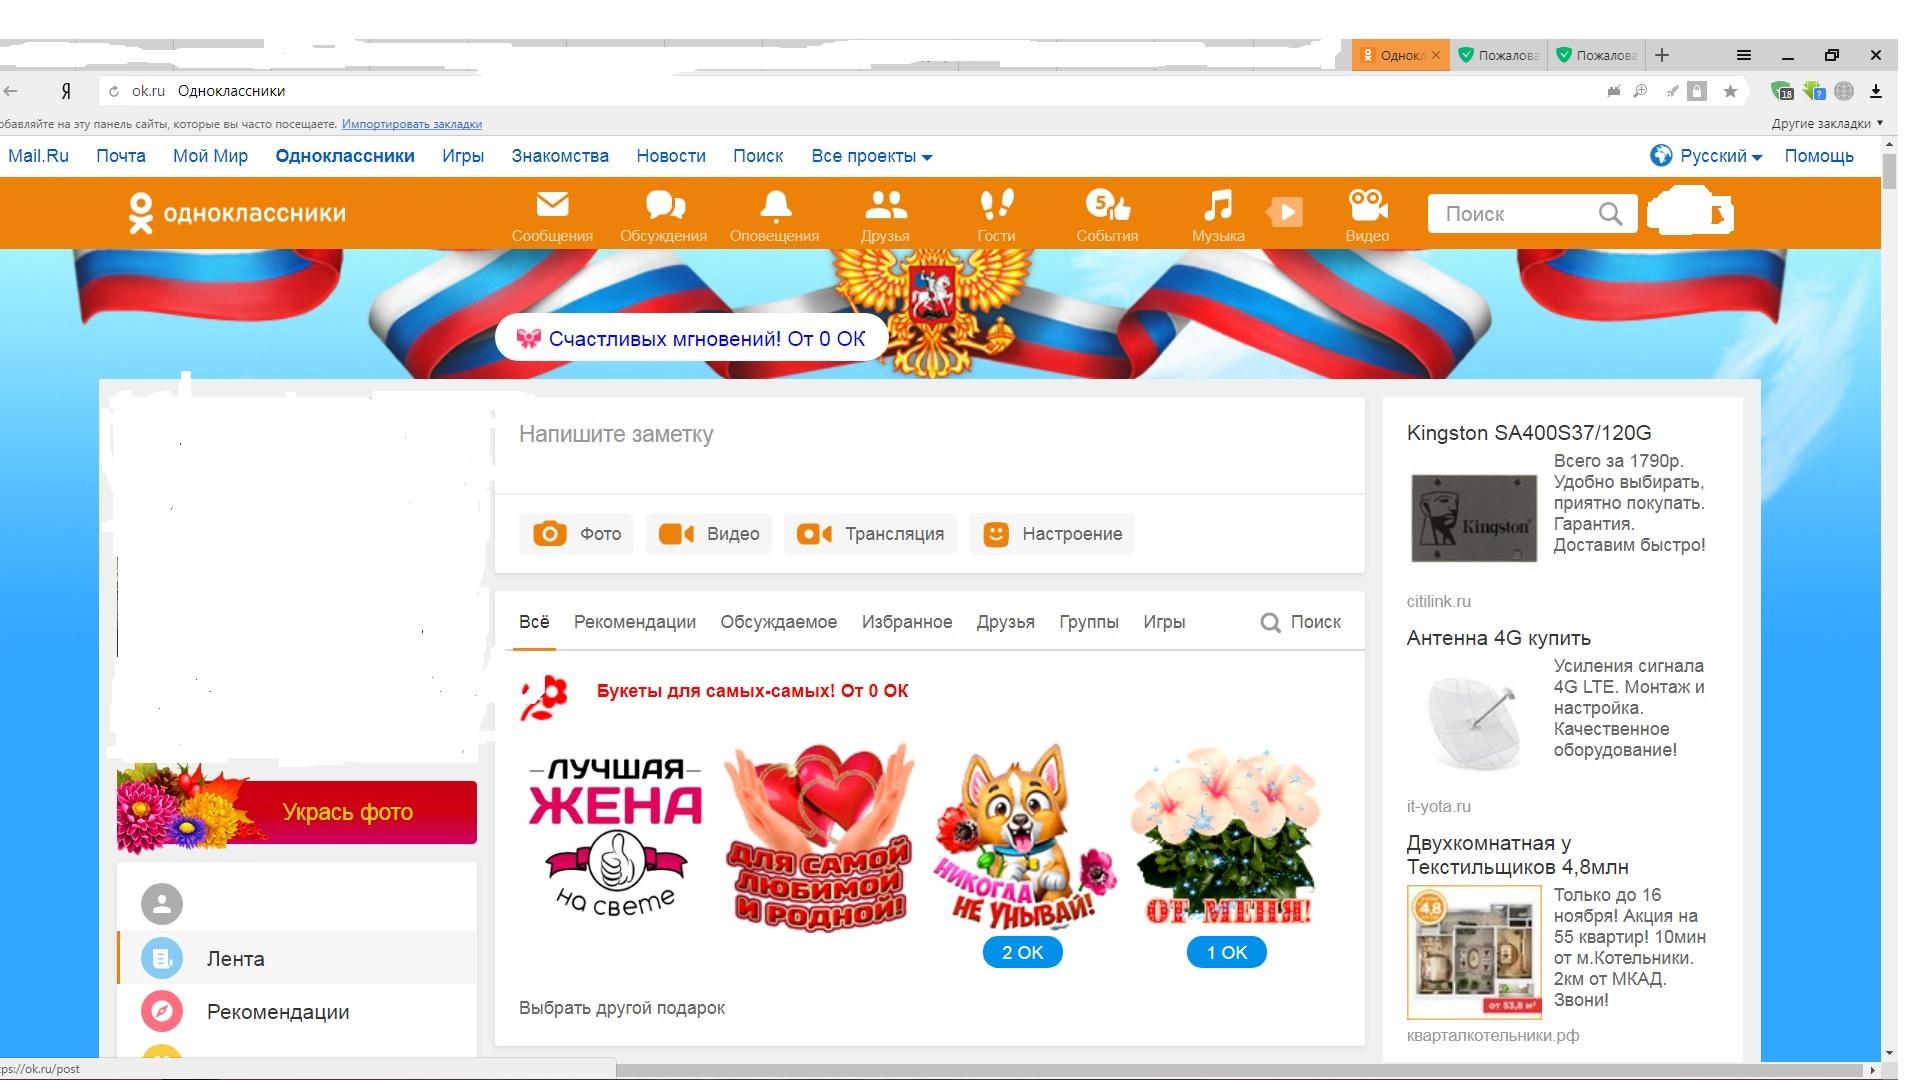 ok ru · Issue #24654 · AdguardTeam/AdguardFilters · GitHub